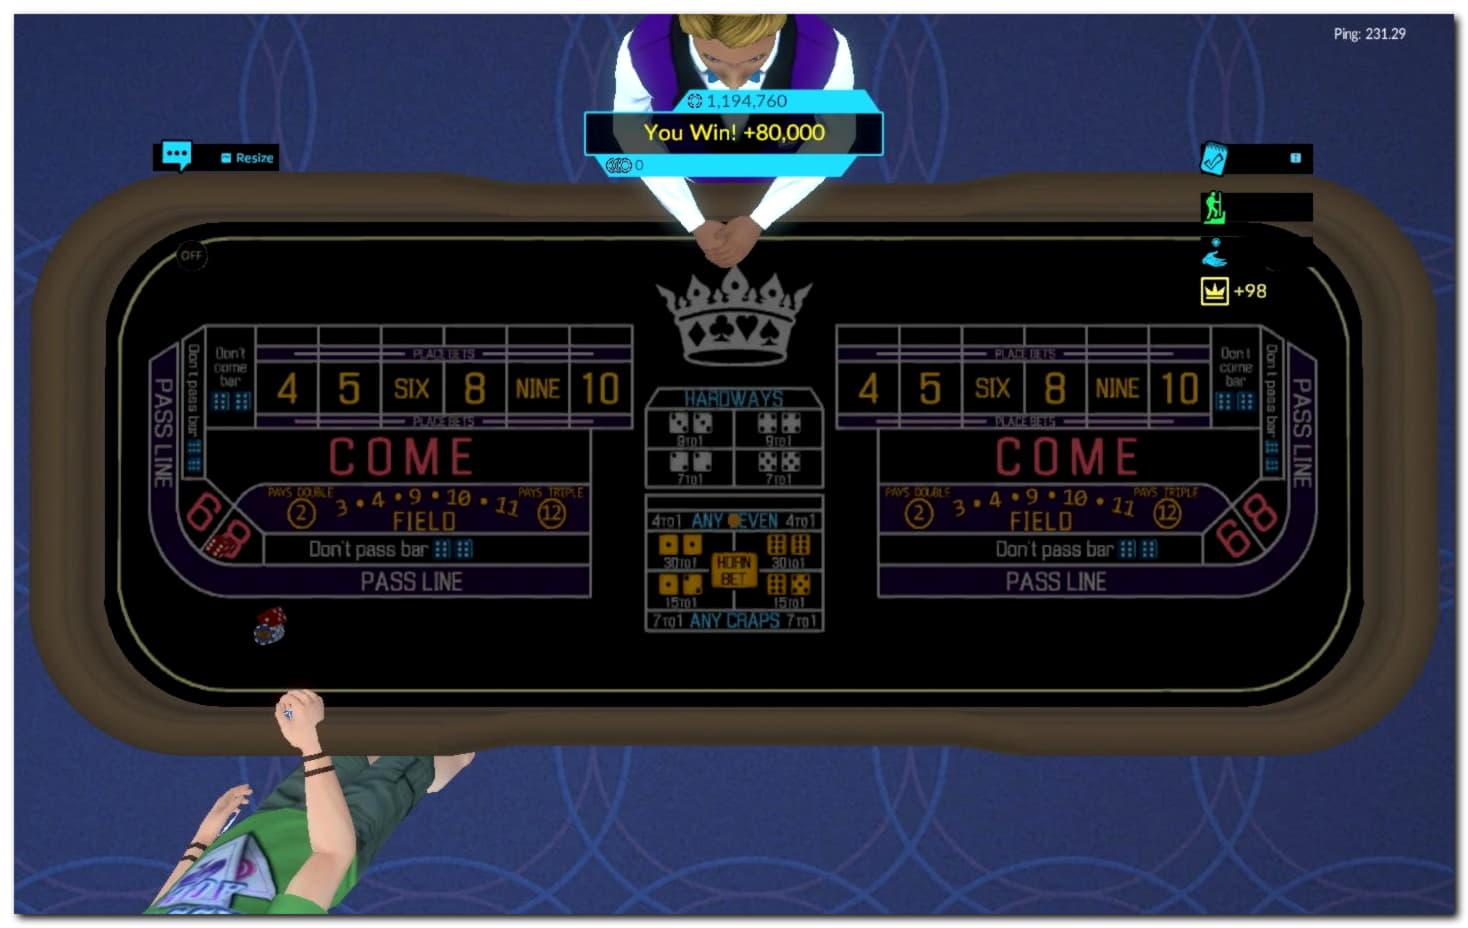 100 Free spins no deposit casino at Karamba Casino